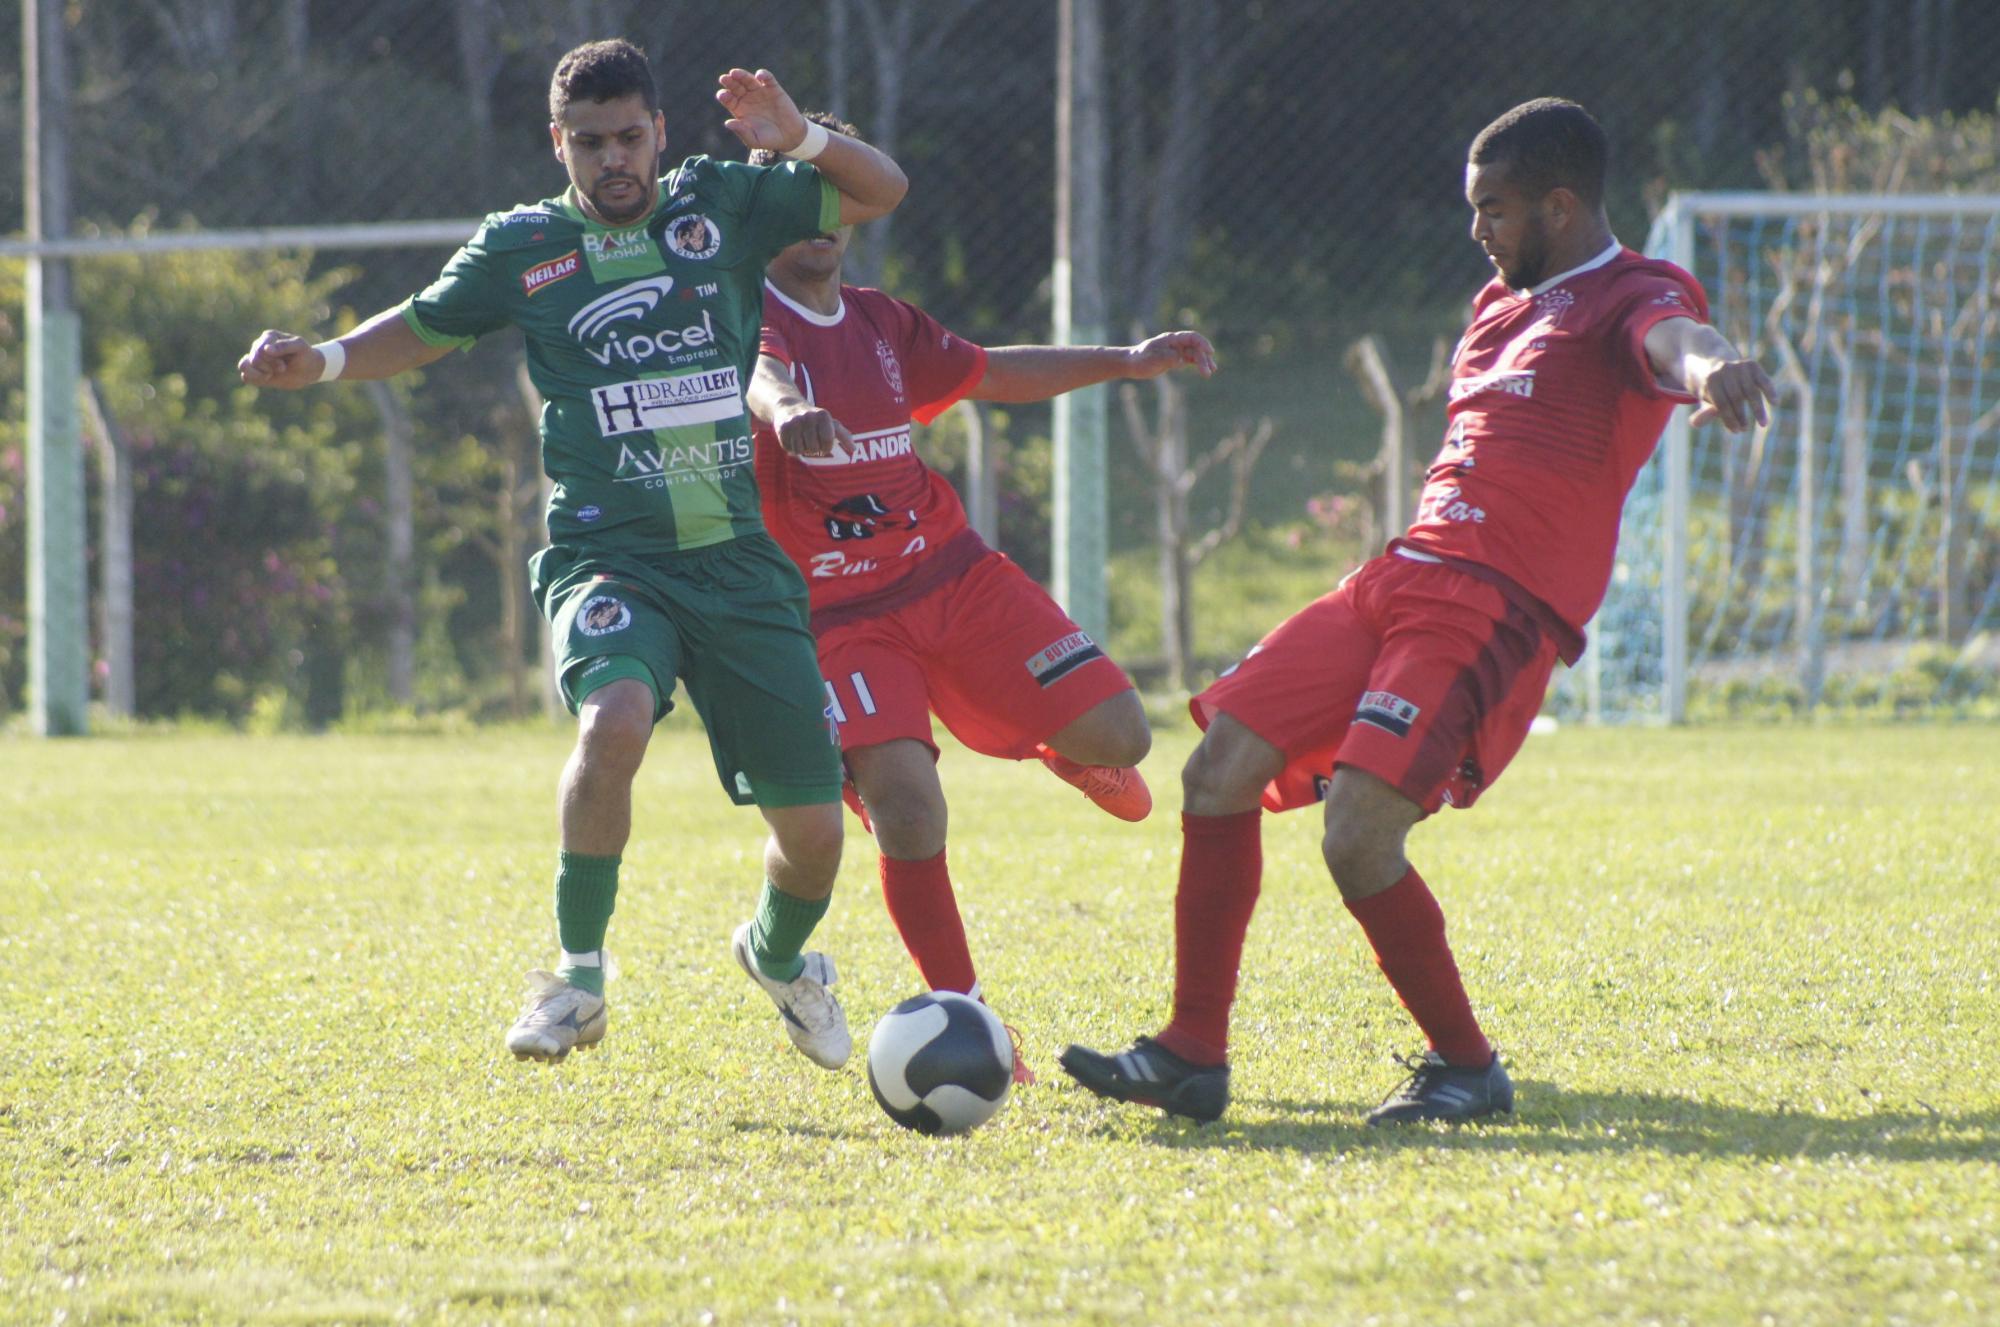 Liga: Serra Cima inaugura arquibancada e goleia o Canto do Rio